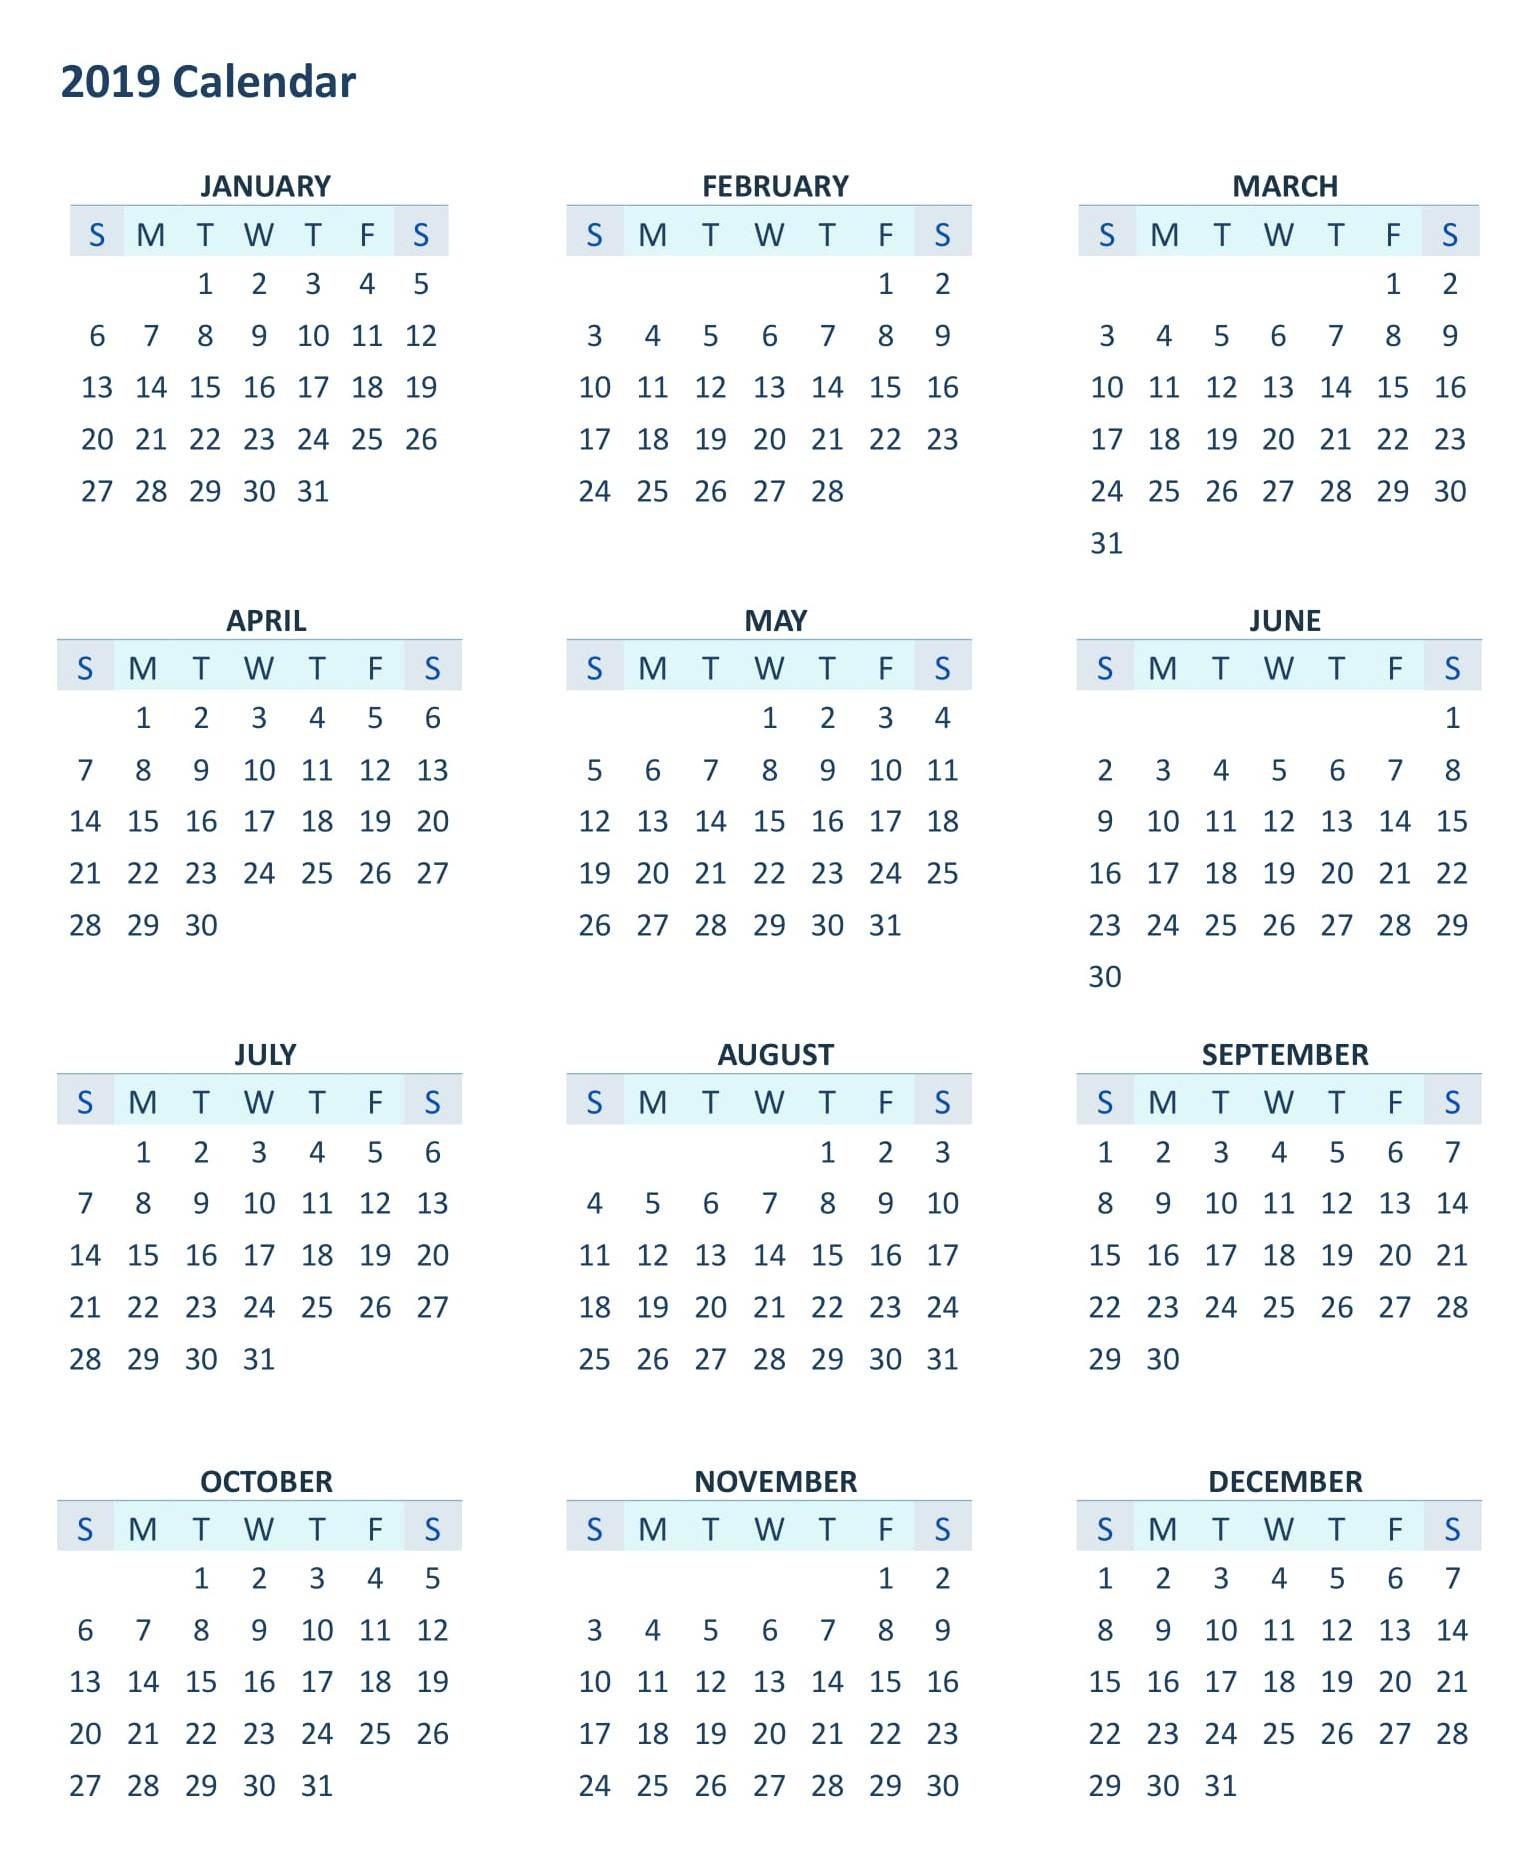 2019 12 Month Calendar Printable Yearly 12 Month Calendar 2019 with regard to Blank 12 Month Calendar Printable